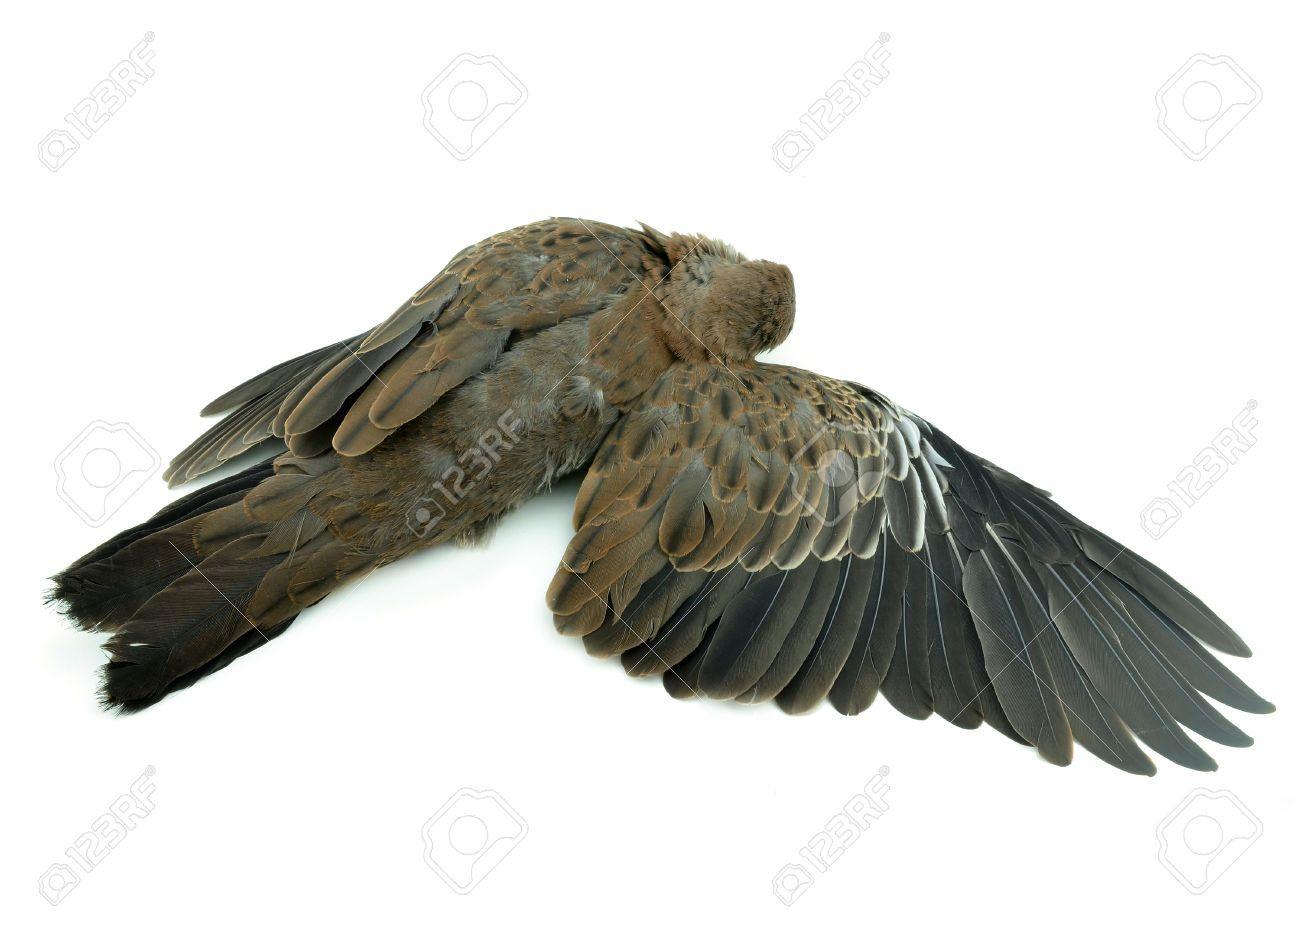 Http Previews 123rf Com Images Evegenesis Evegenesis1404 Evegenesis140400473 27584333 Dead Bird On White Background Stock Photo J True Art Bird Taxidermy Art